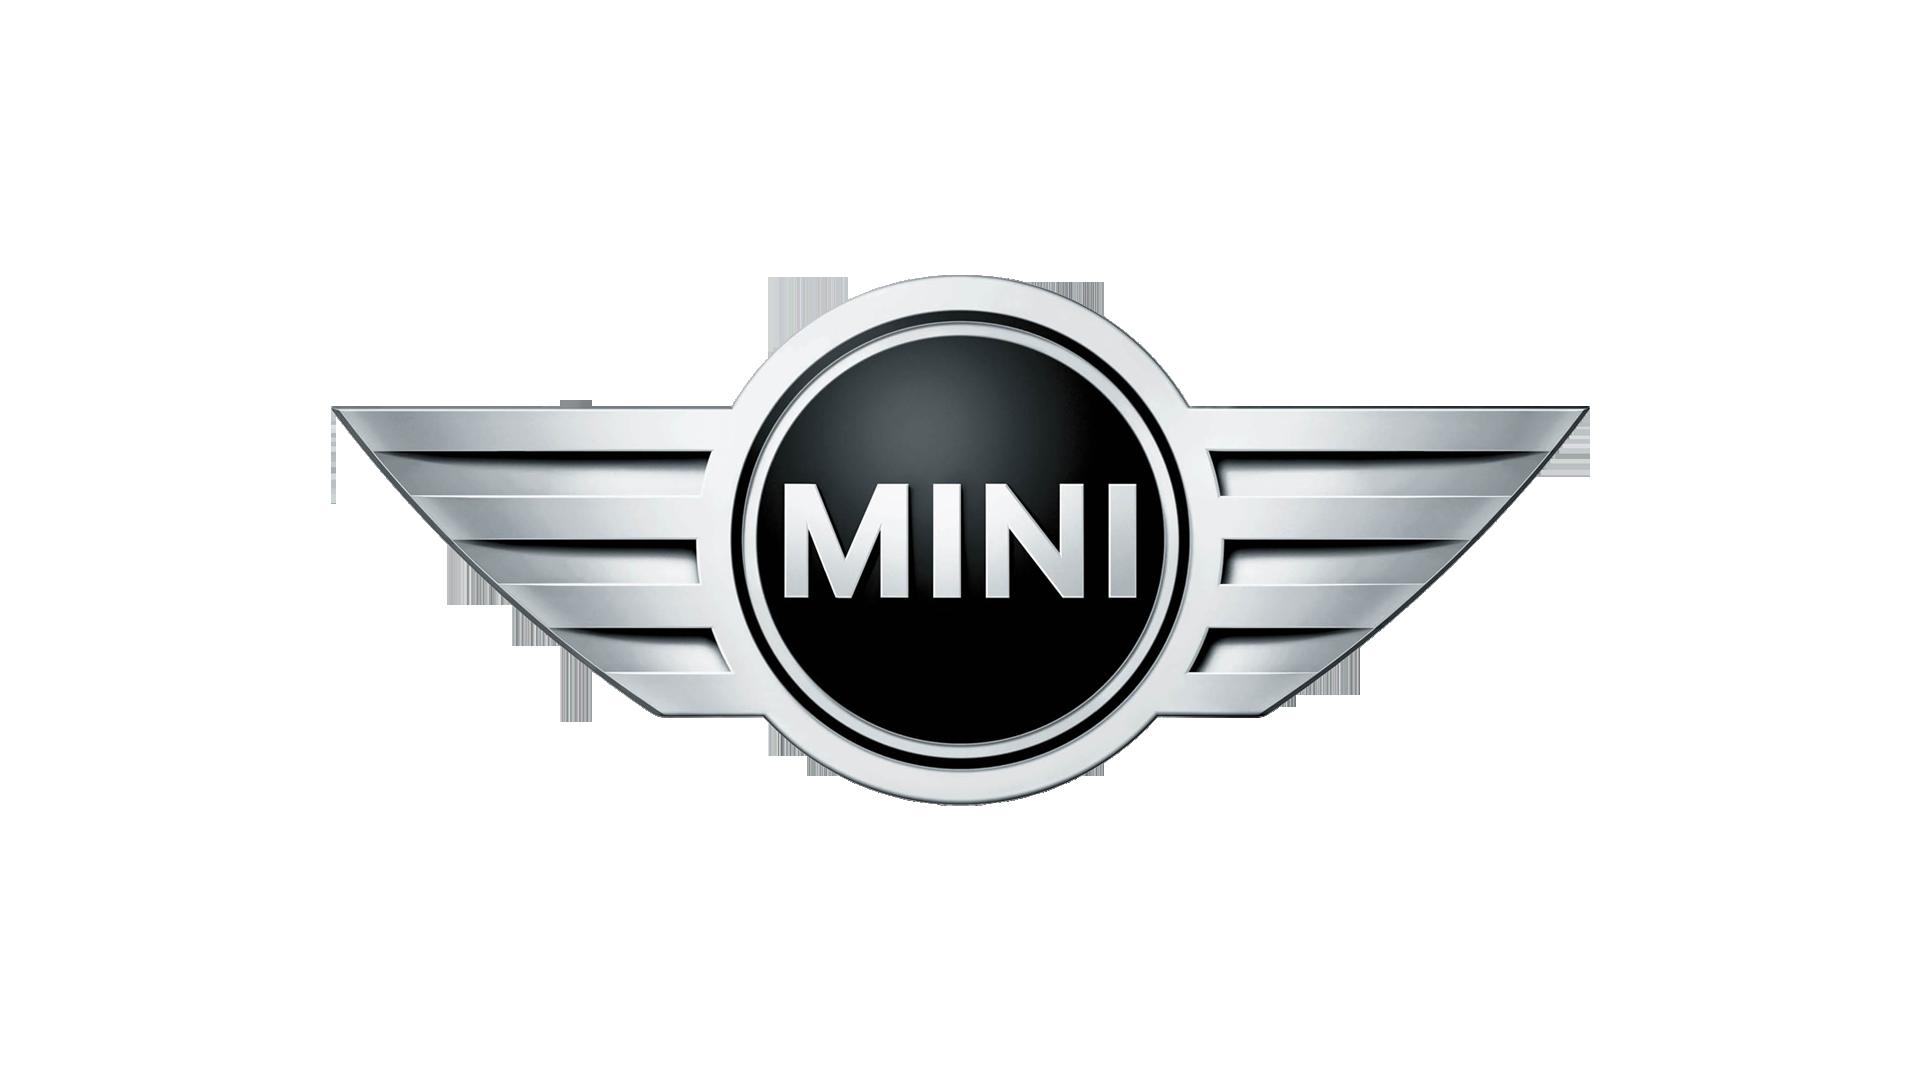 Mini Logo (2001-Present) 1920x1080 HD png - Mini HD PNG